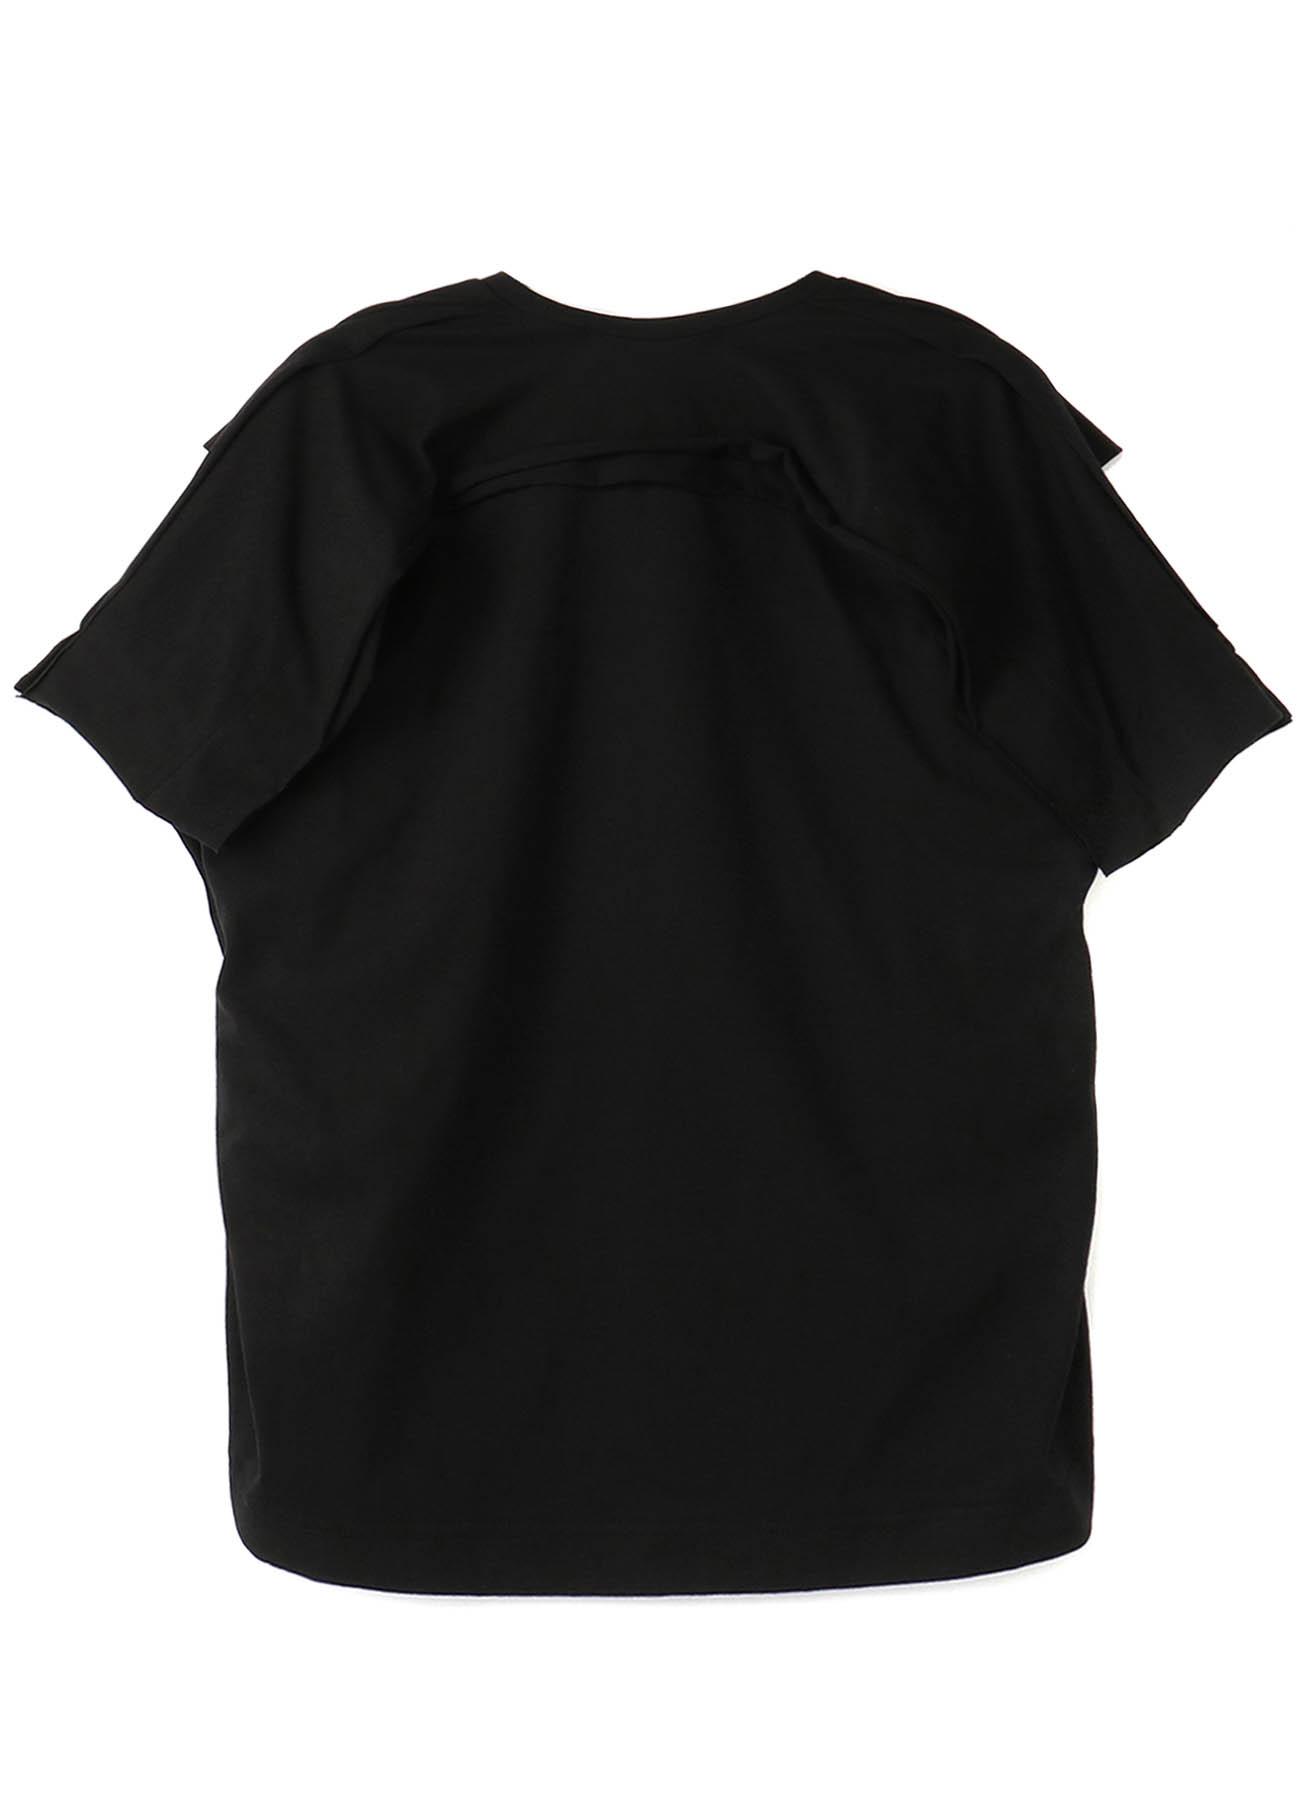 20/-C Plain Stitch Cut Out Design T